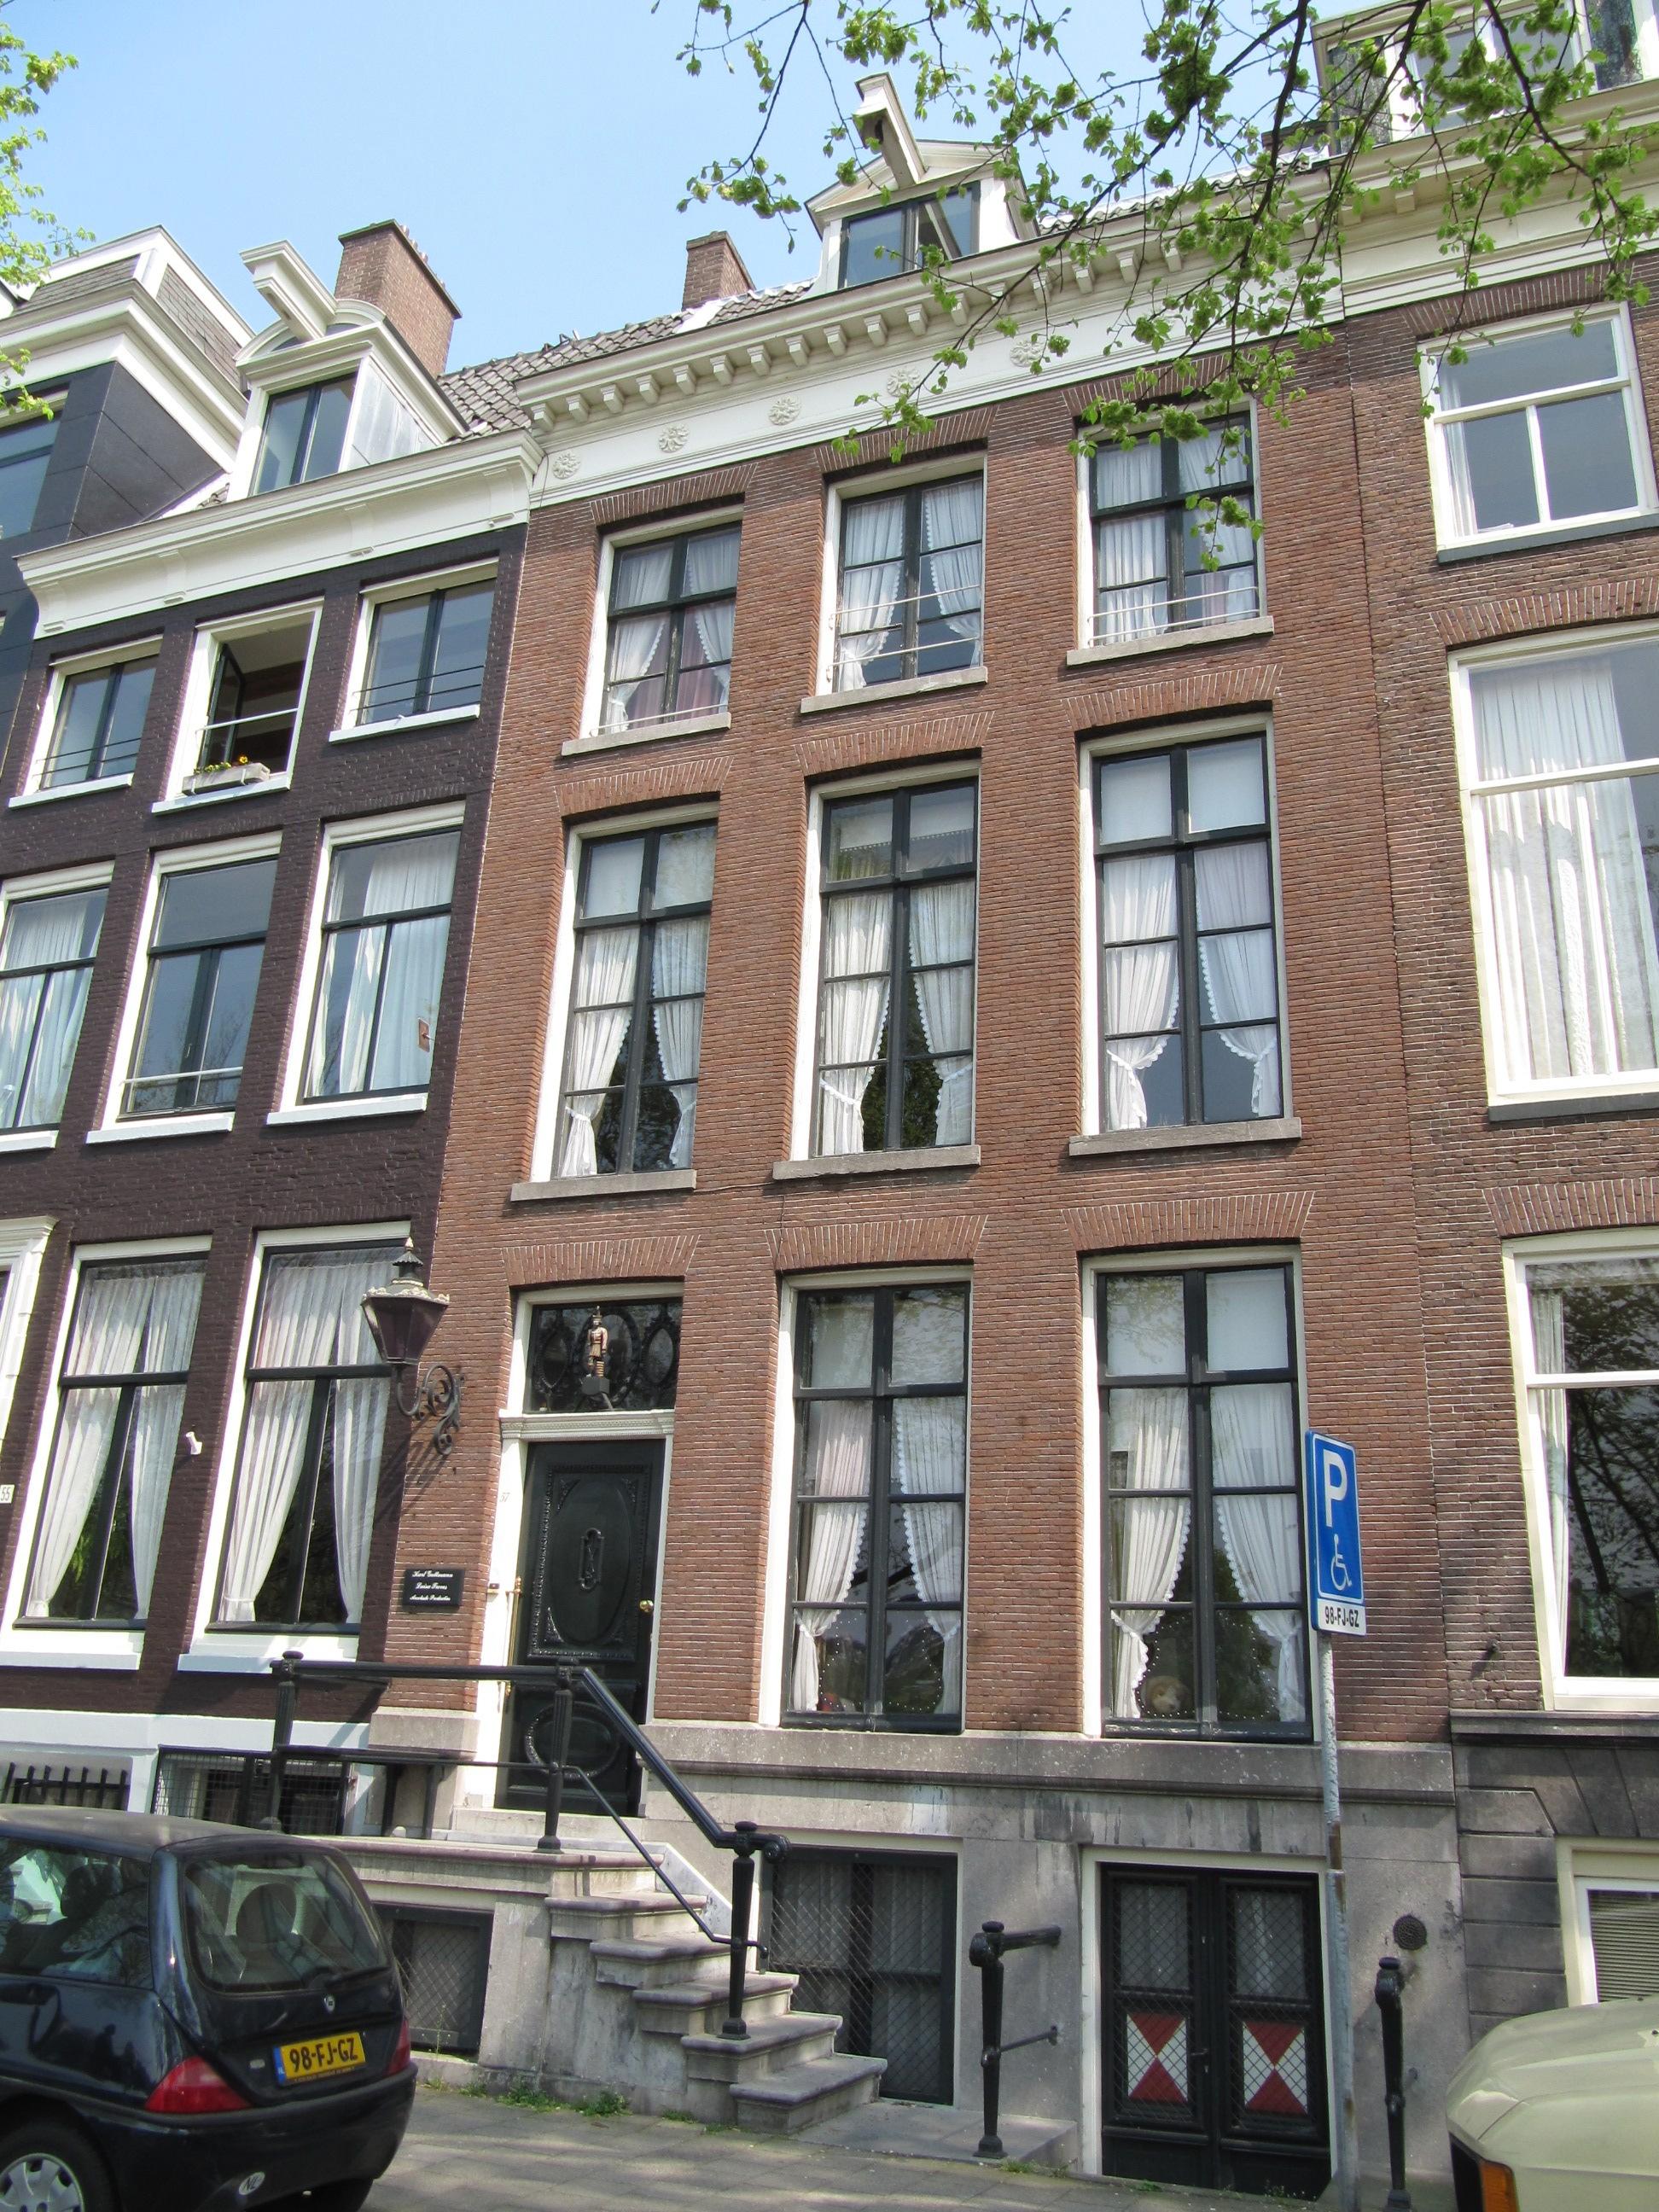 Huis onderdeel van oud huizenblok met doorlopend dwars dak in amsterdam monument - Huis verlenging oud huis ...